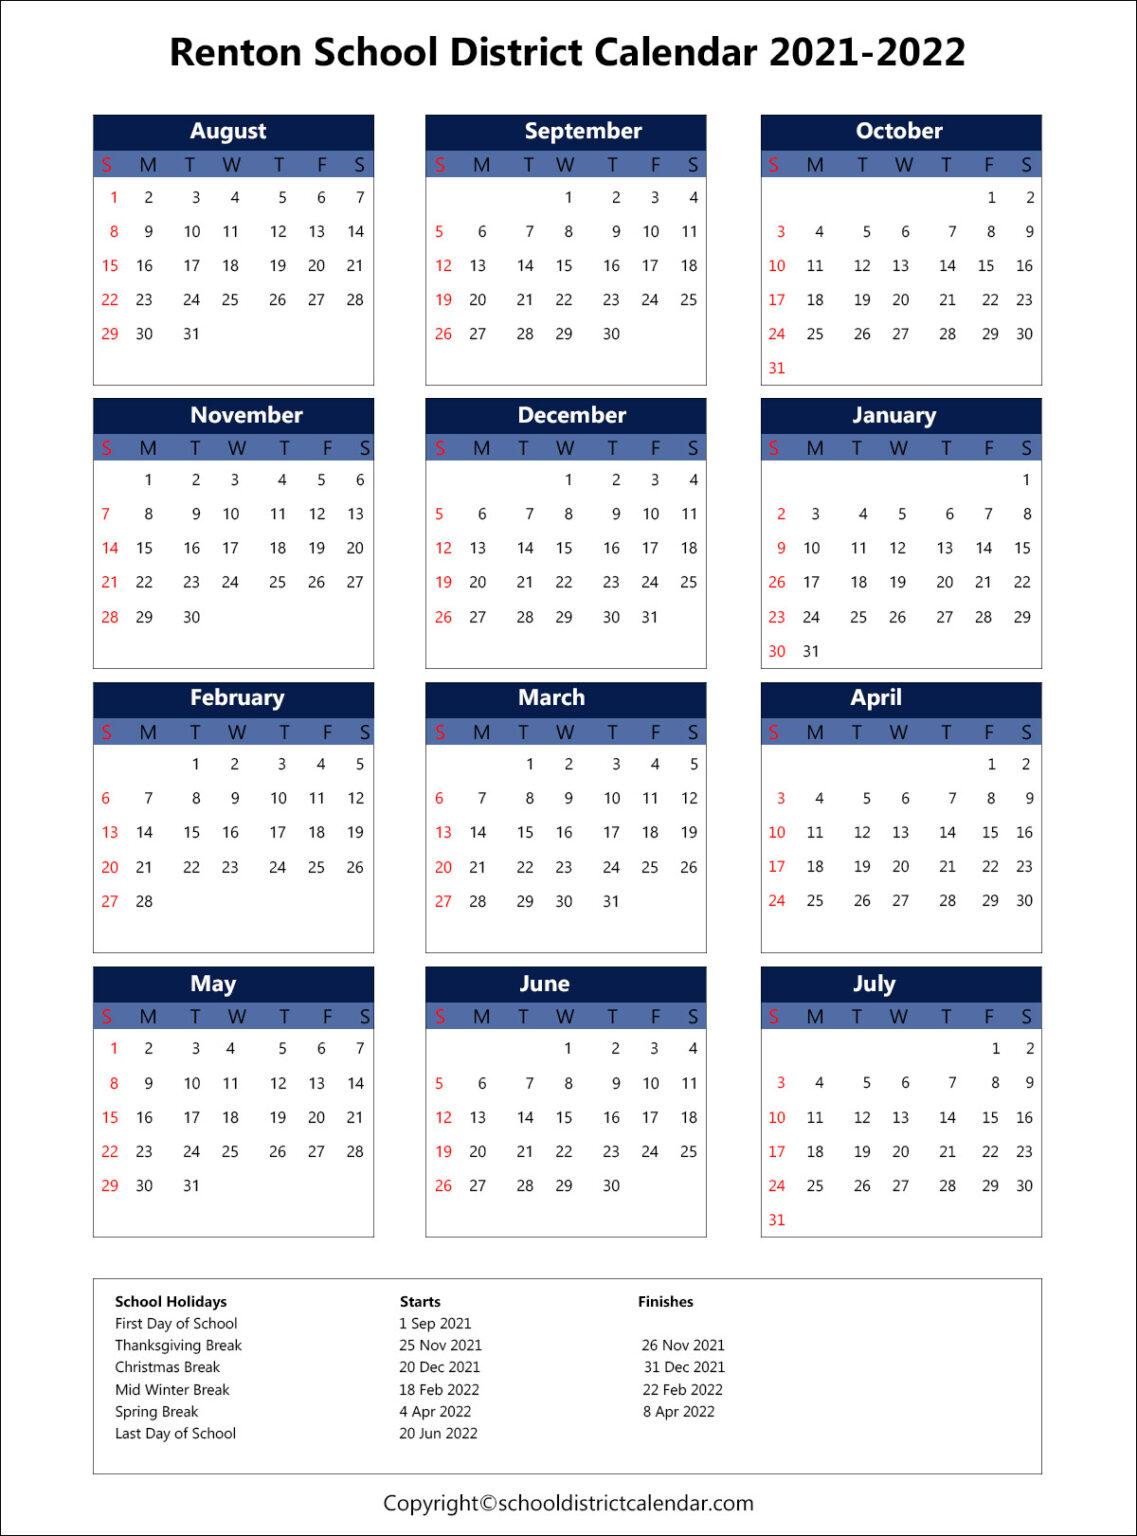 Renton School District Calendar Holidays 2021-2022 pertaining to Fresno Unified School Calendar 2022